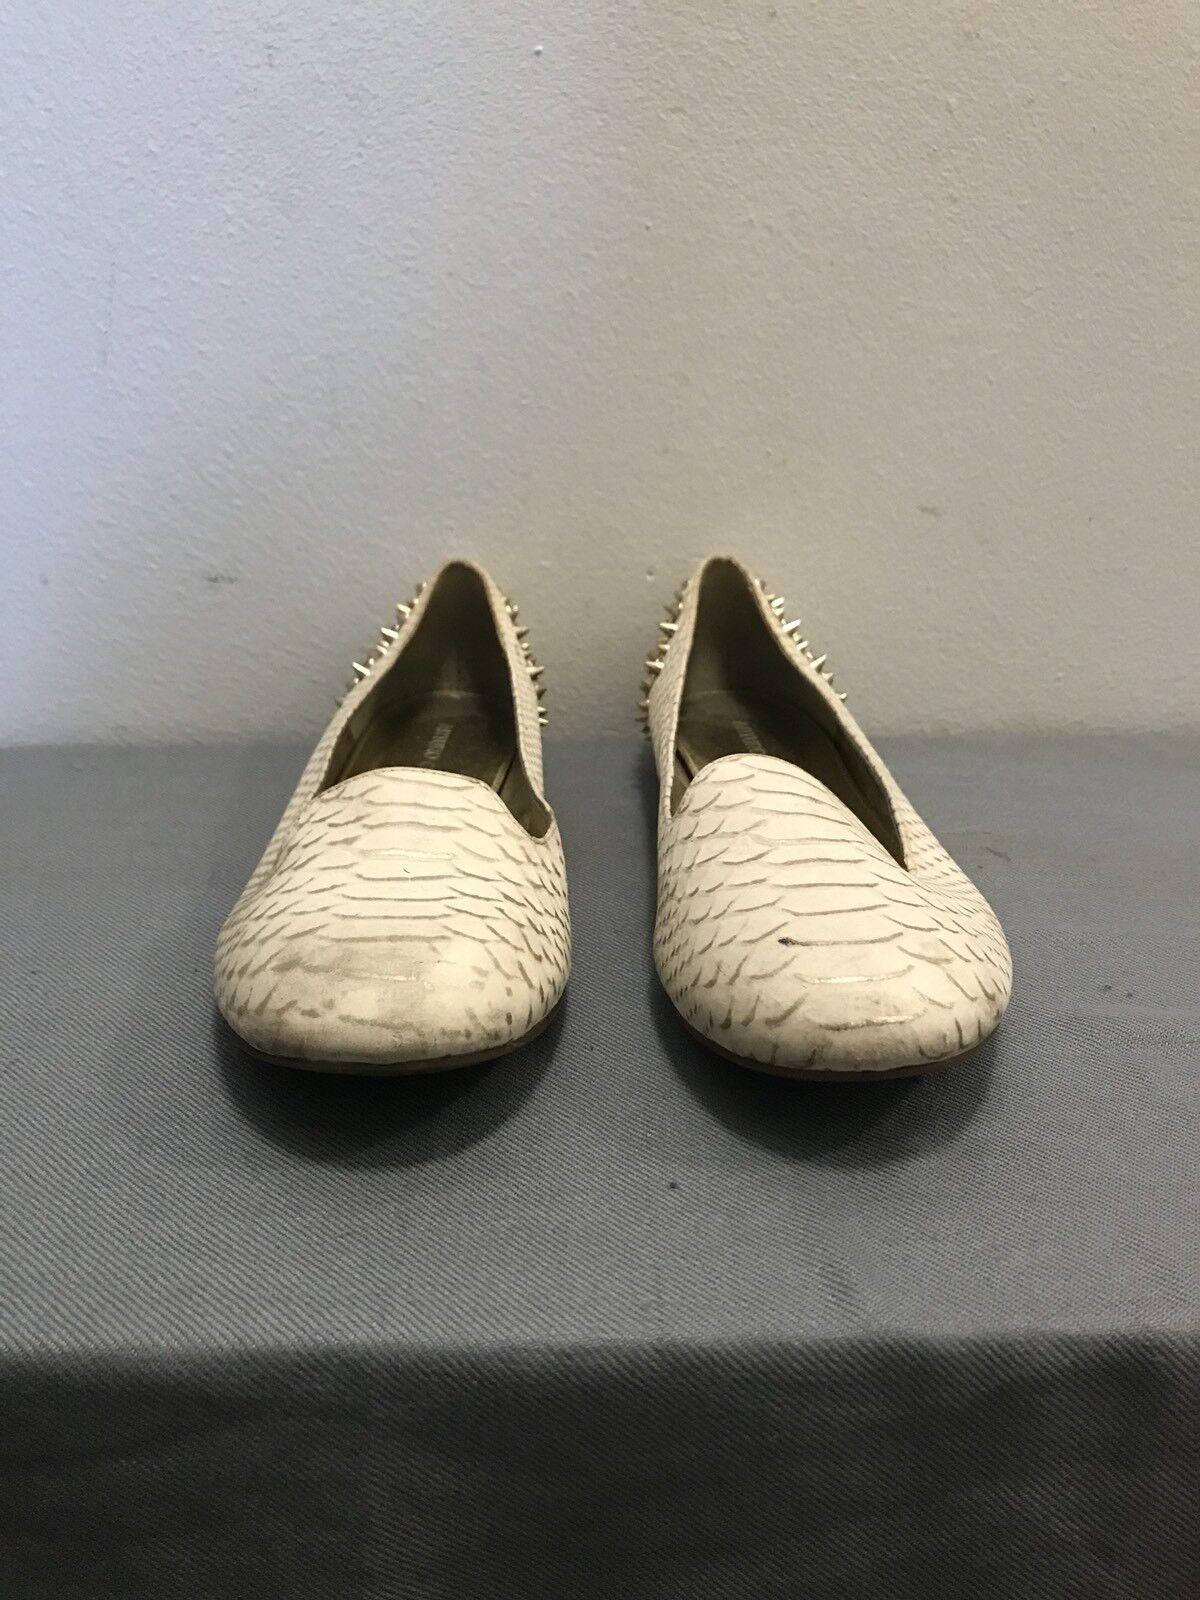 arturo chiang Studded Bonni shoes